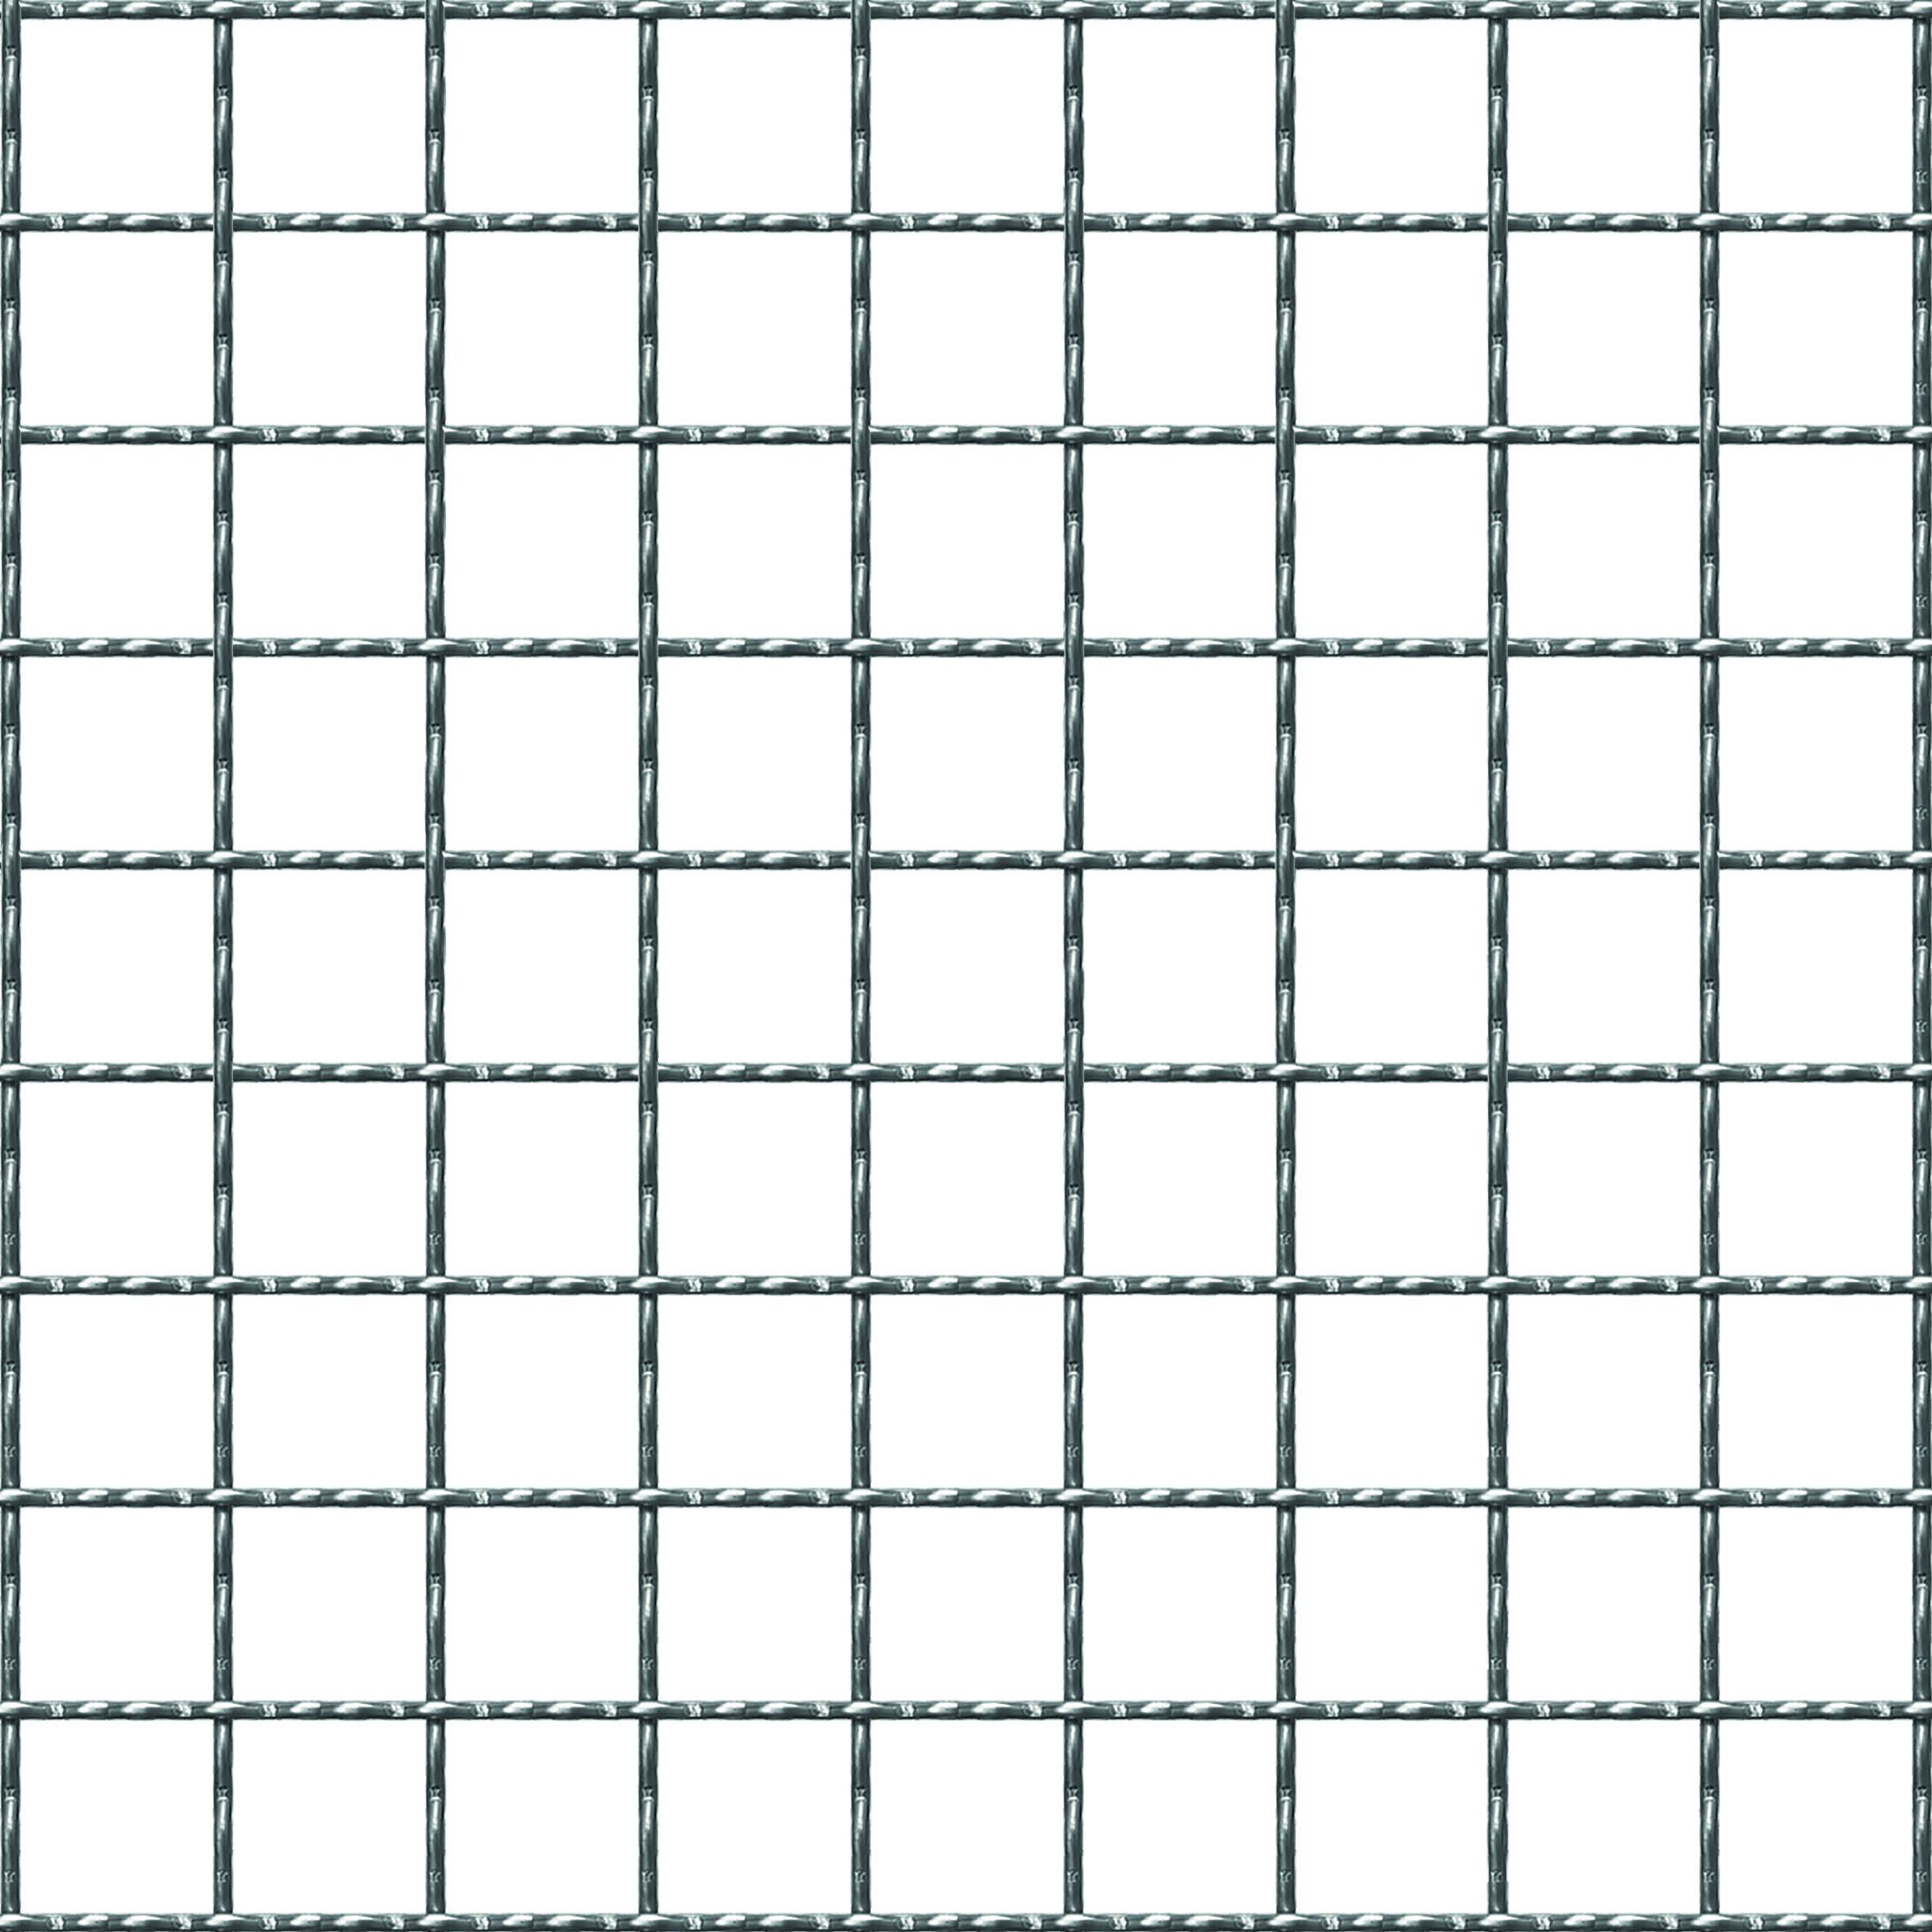 Beeld of Gegolfde draadnet 20 x 20